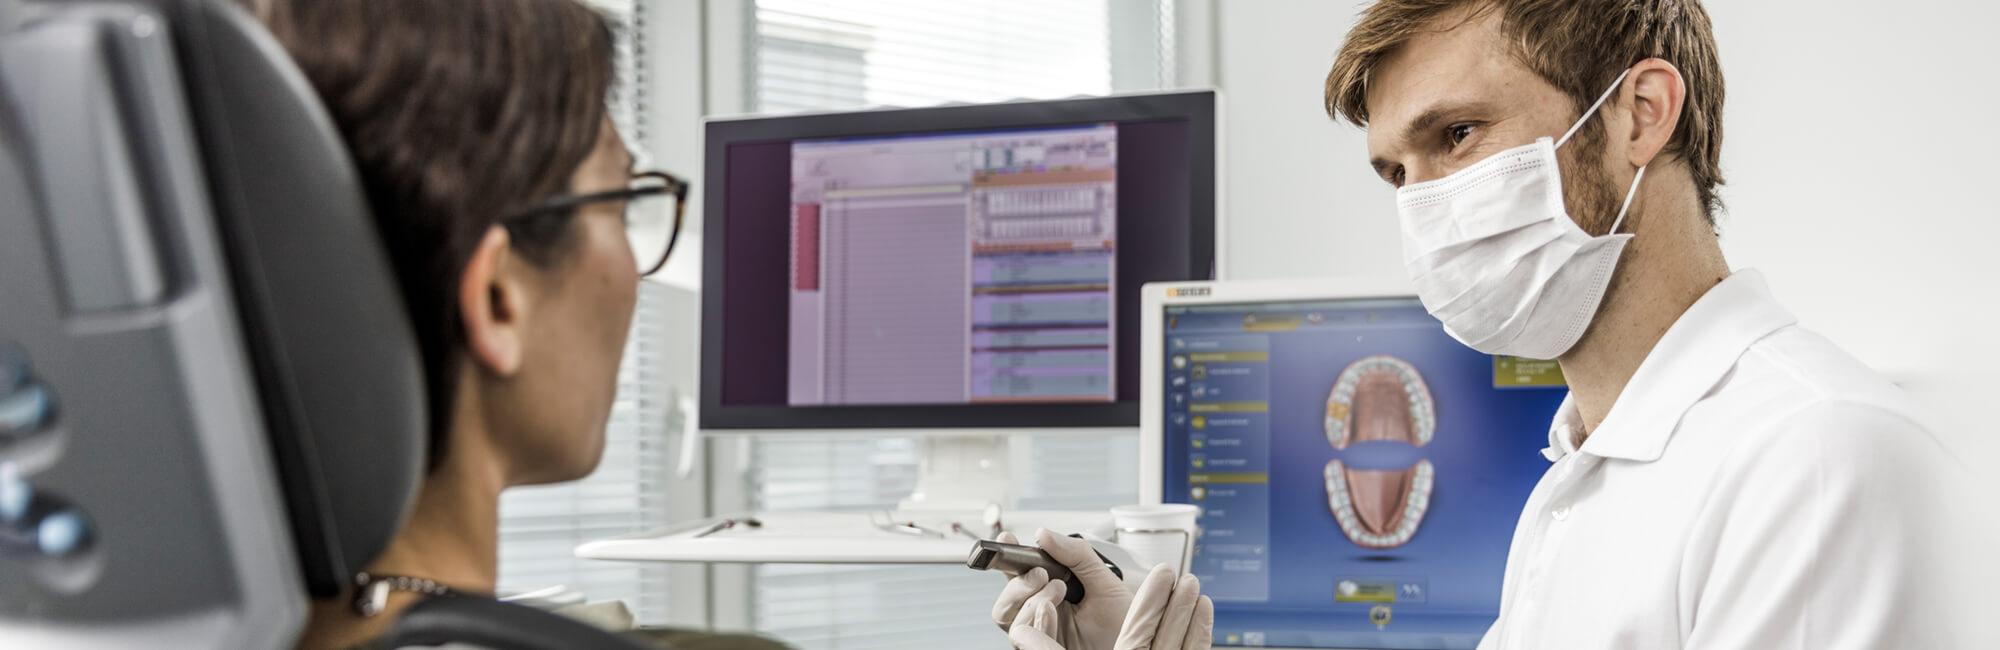 Implantologie Köln Rondorf - Tiddens - Slider